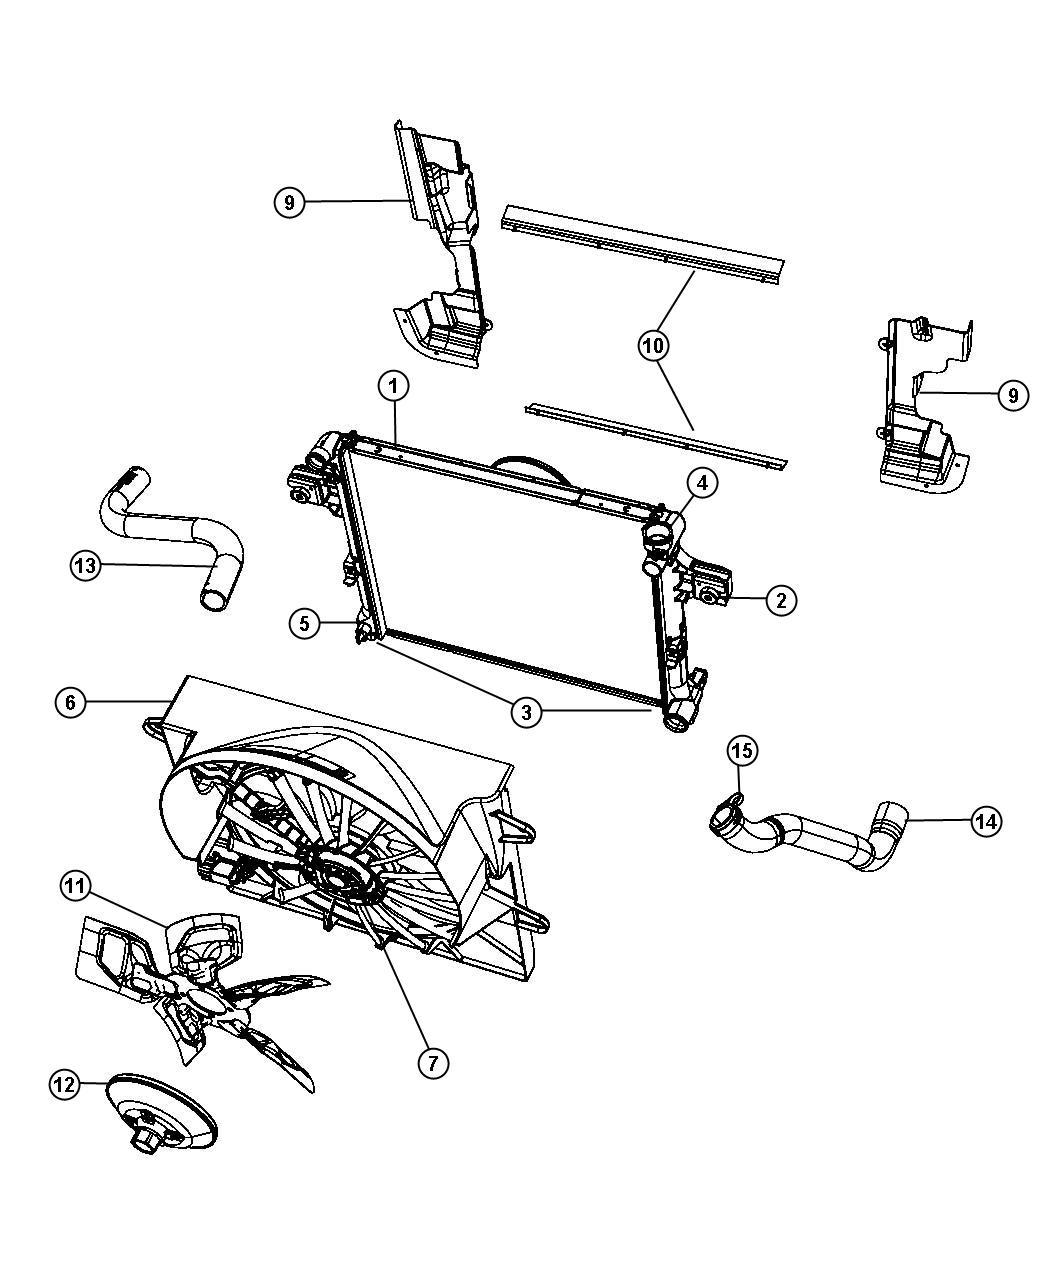 Diagram Jeep Cherokee Cooling Fan Wiring Diagram